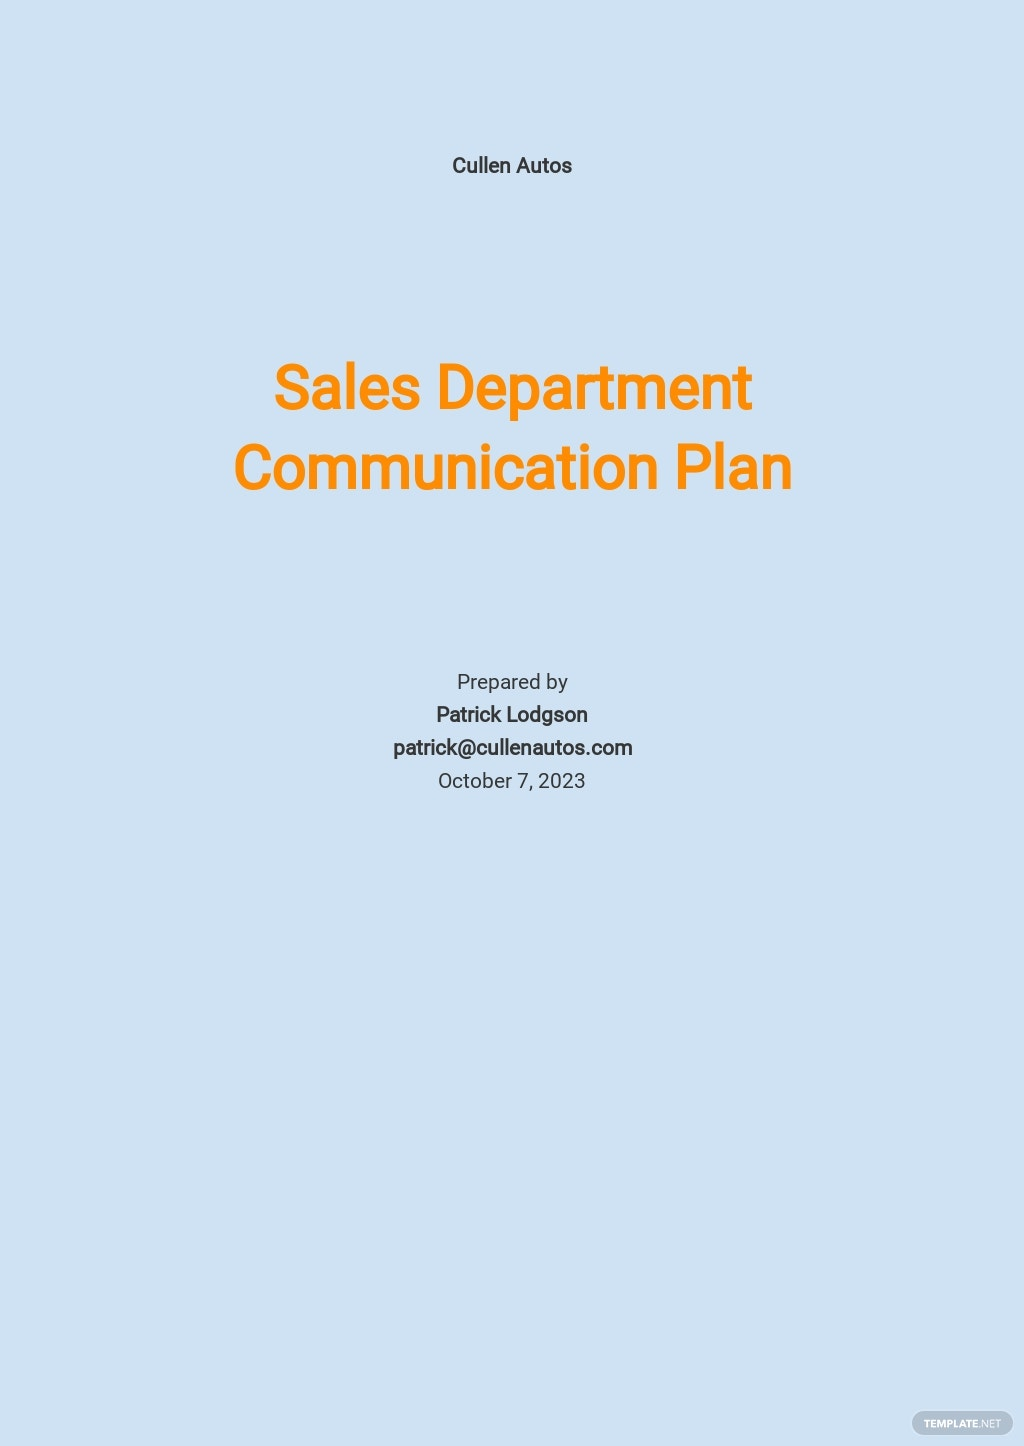 Sales Communication Plan Template.jpe